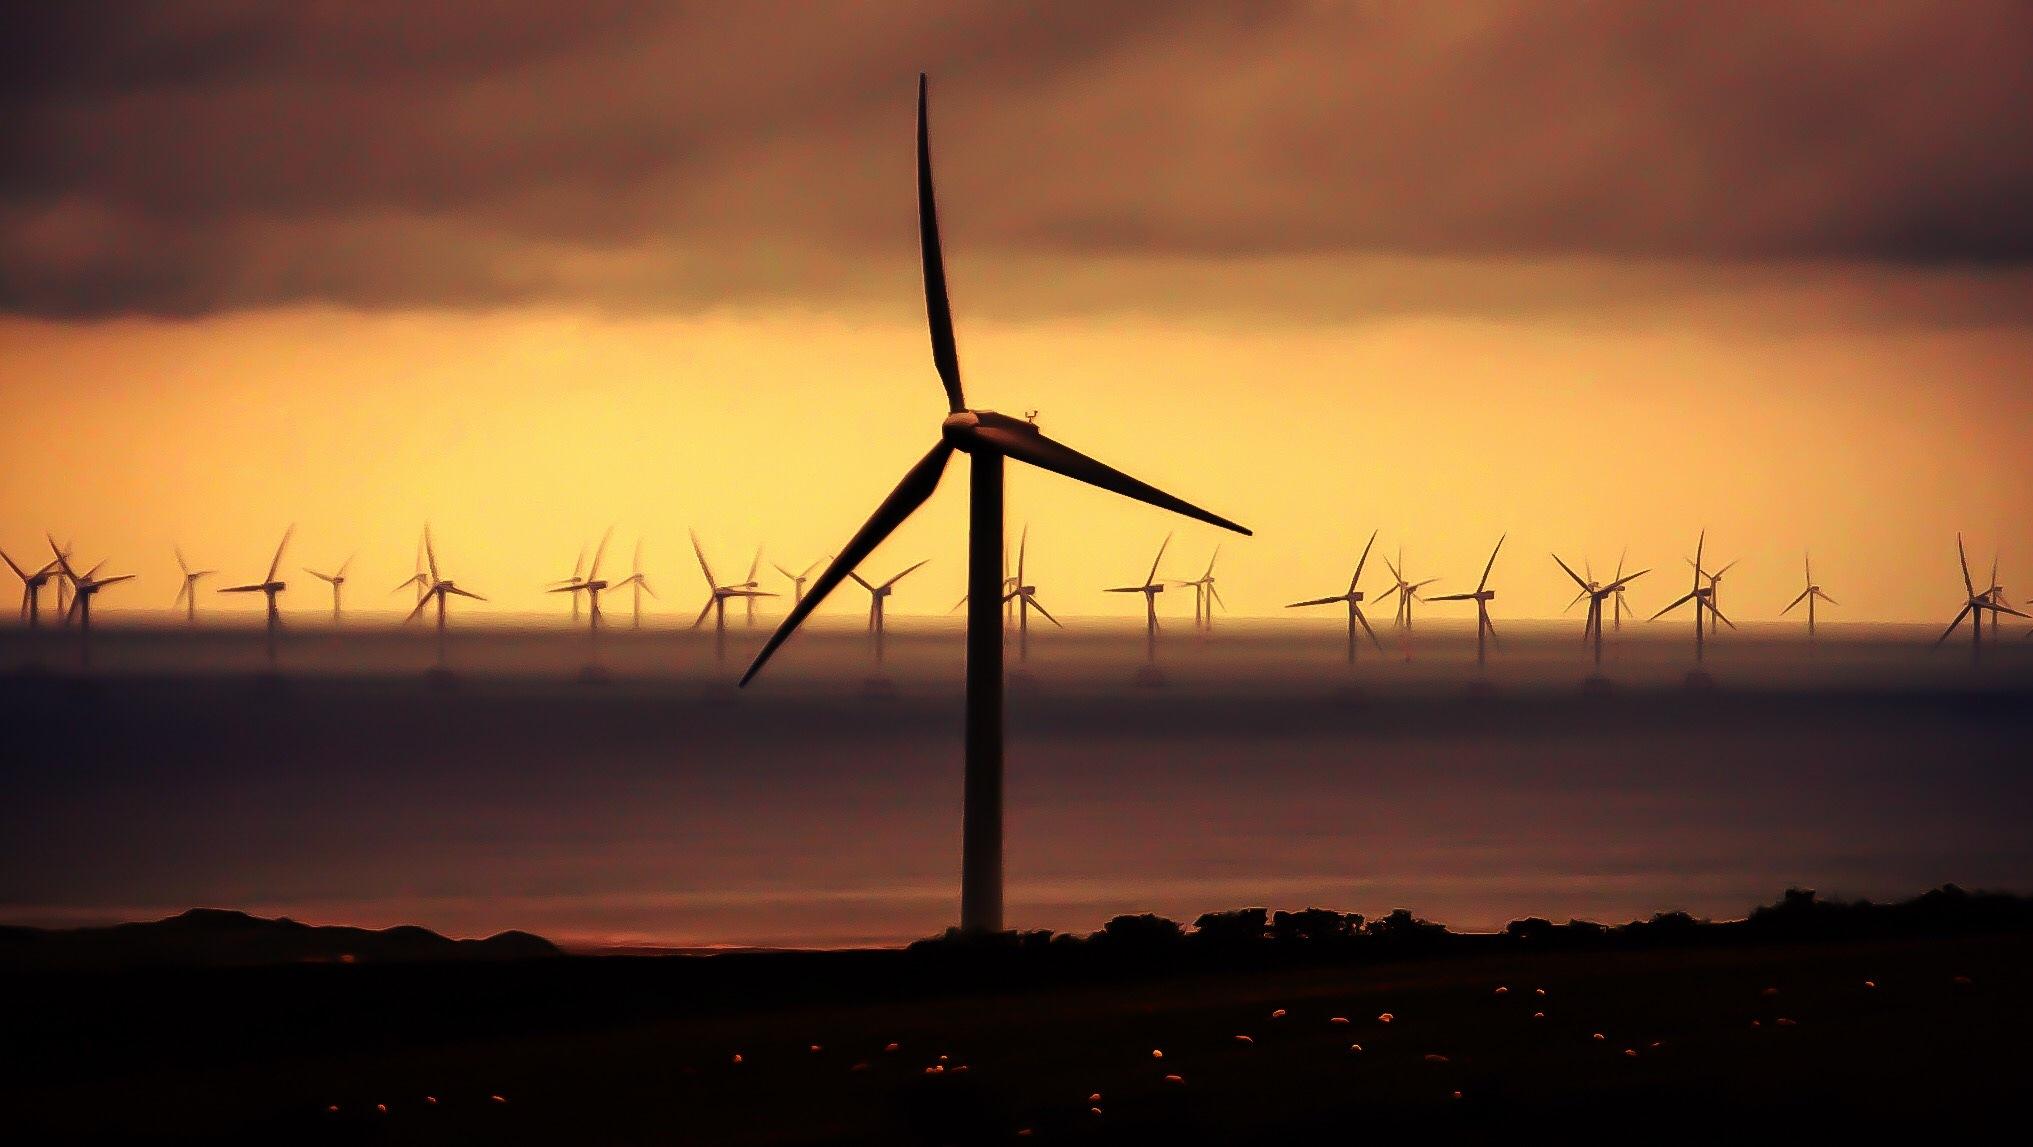 Wind Power...080601 by Michael jjg